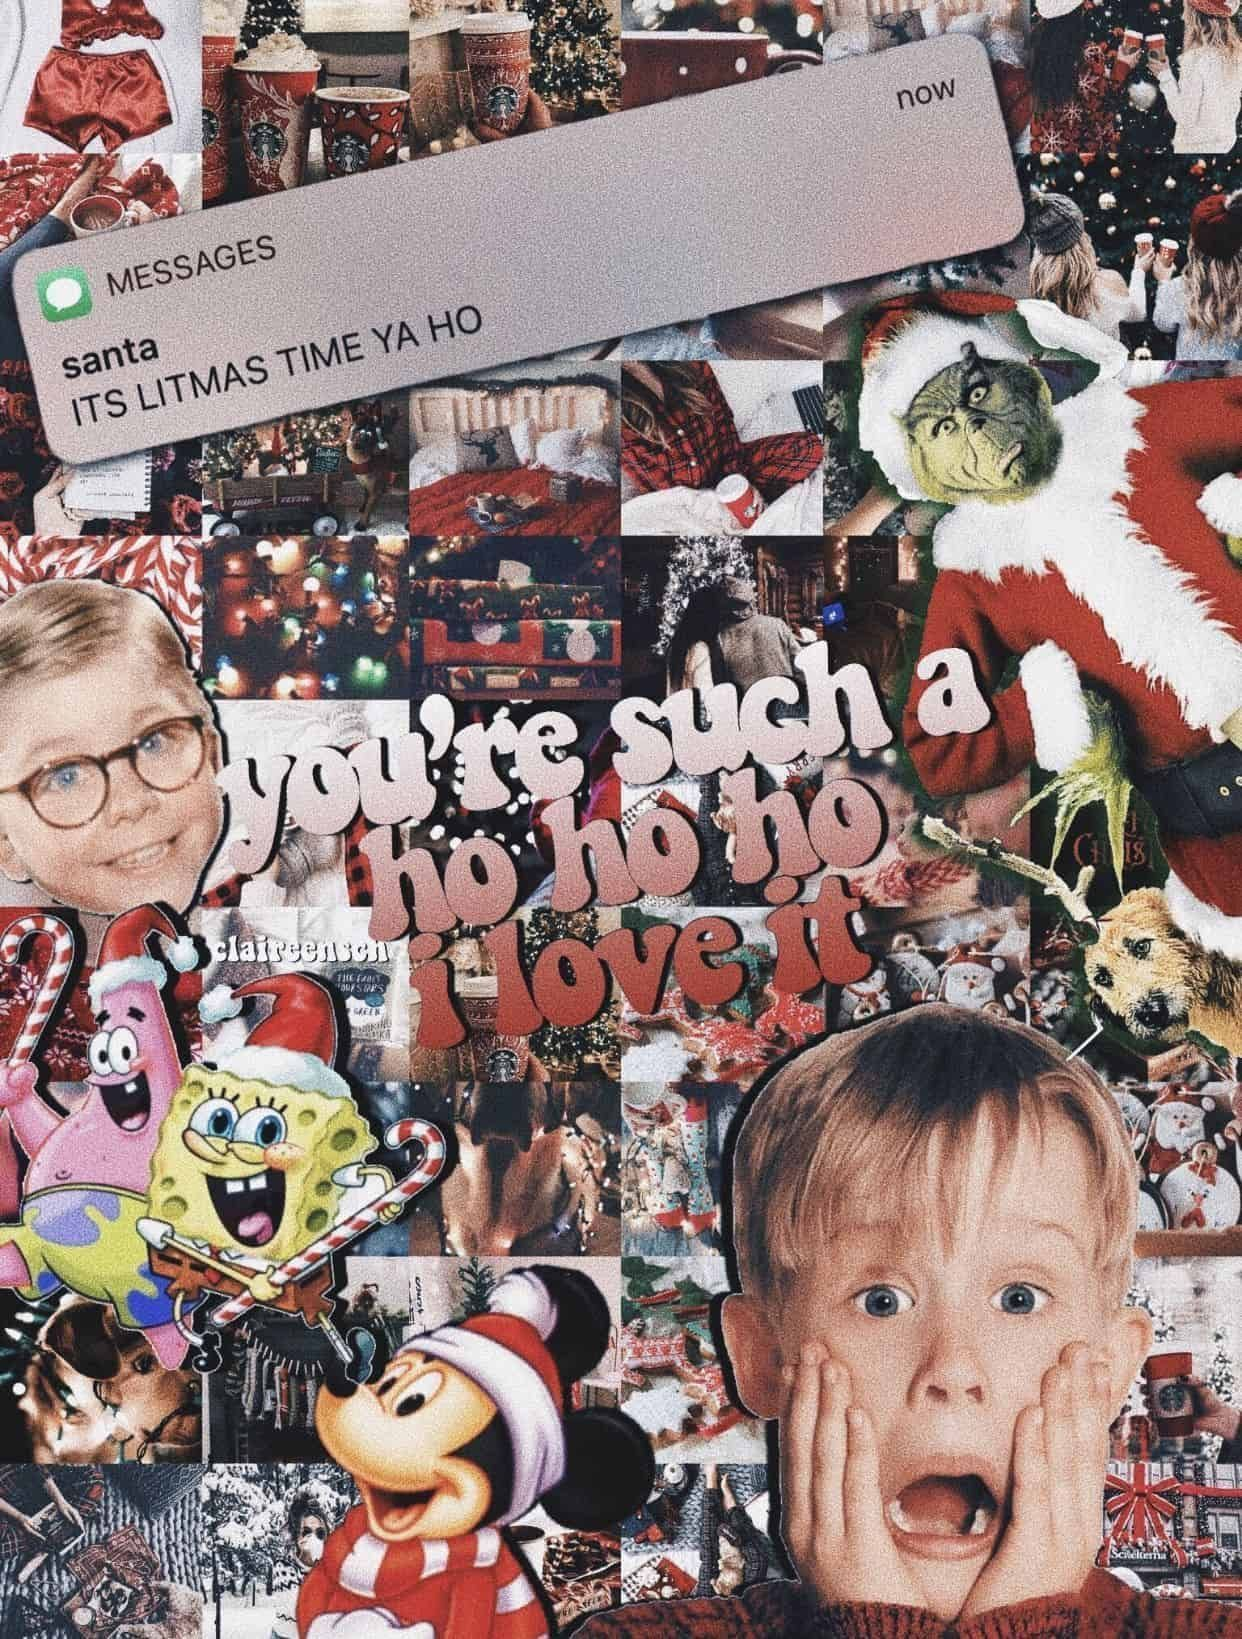 Backgr Backgrounds Christmas Download Free Iphone Phonebackgroundstumblrwi Wallpaper Iphone Christmas Cute Christmas Wallpaper Christmas Phone Wallpaper